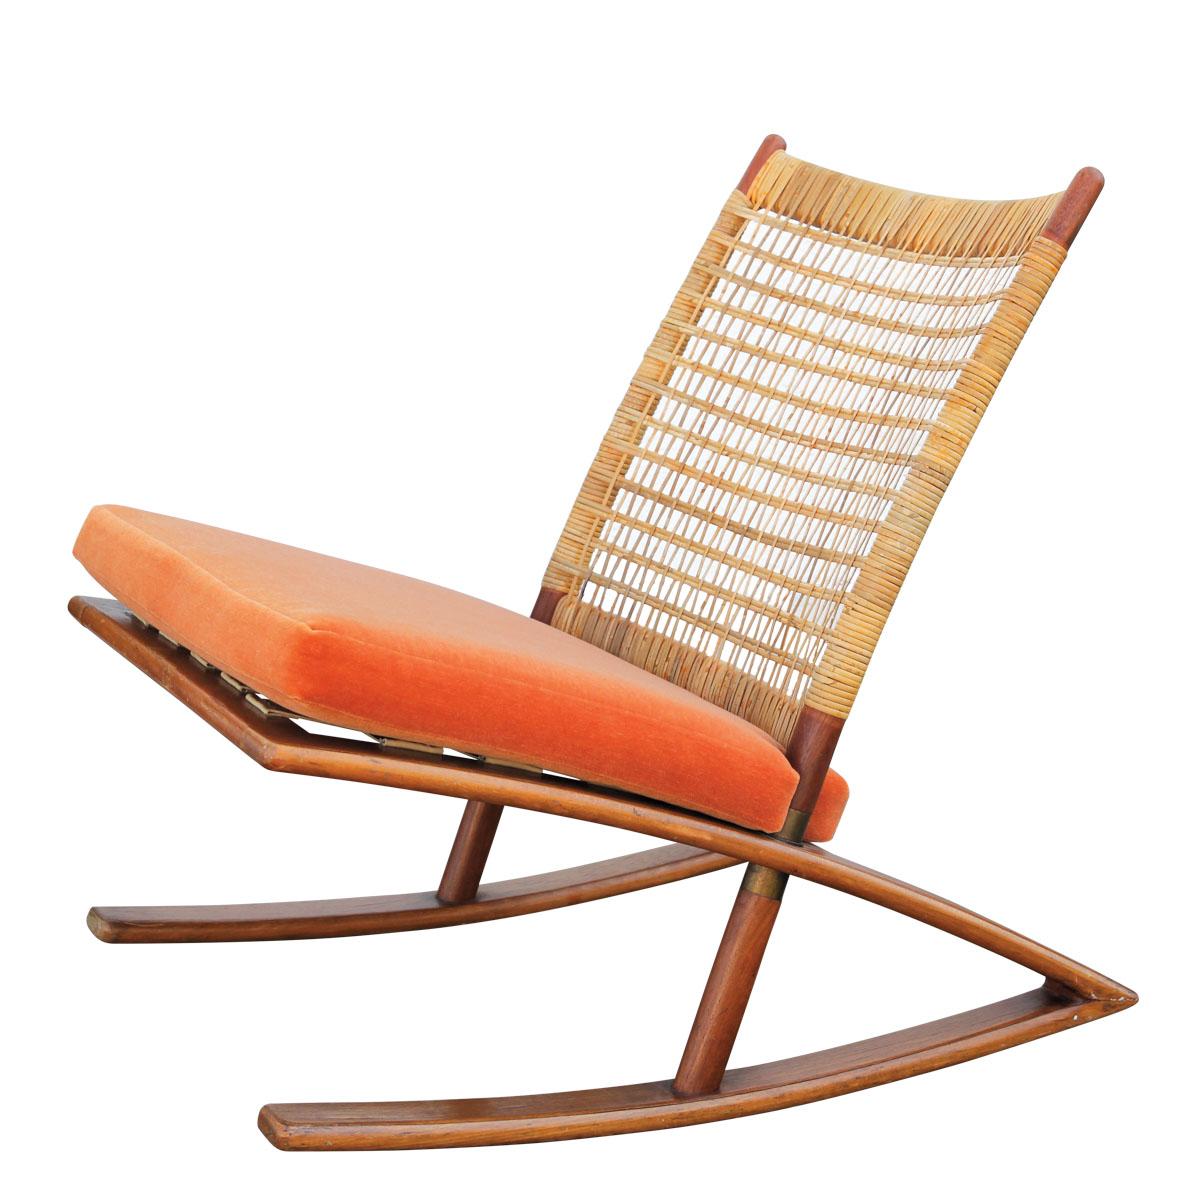 chair with orange cushion